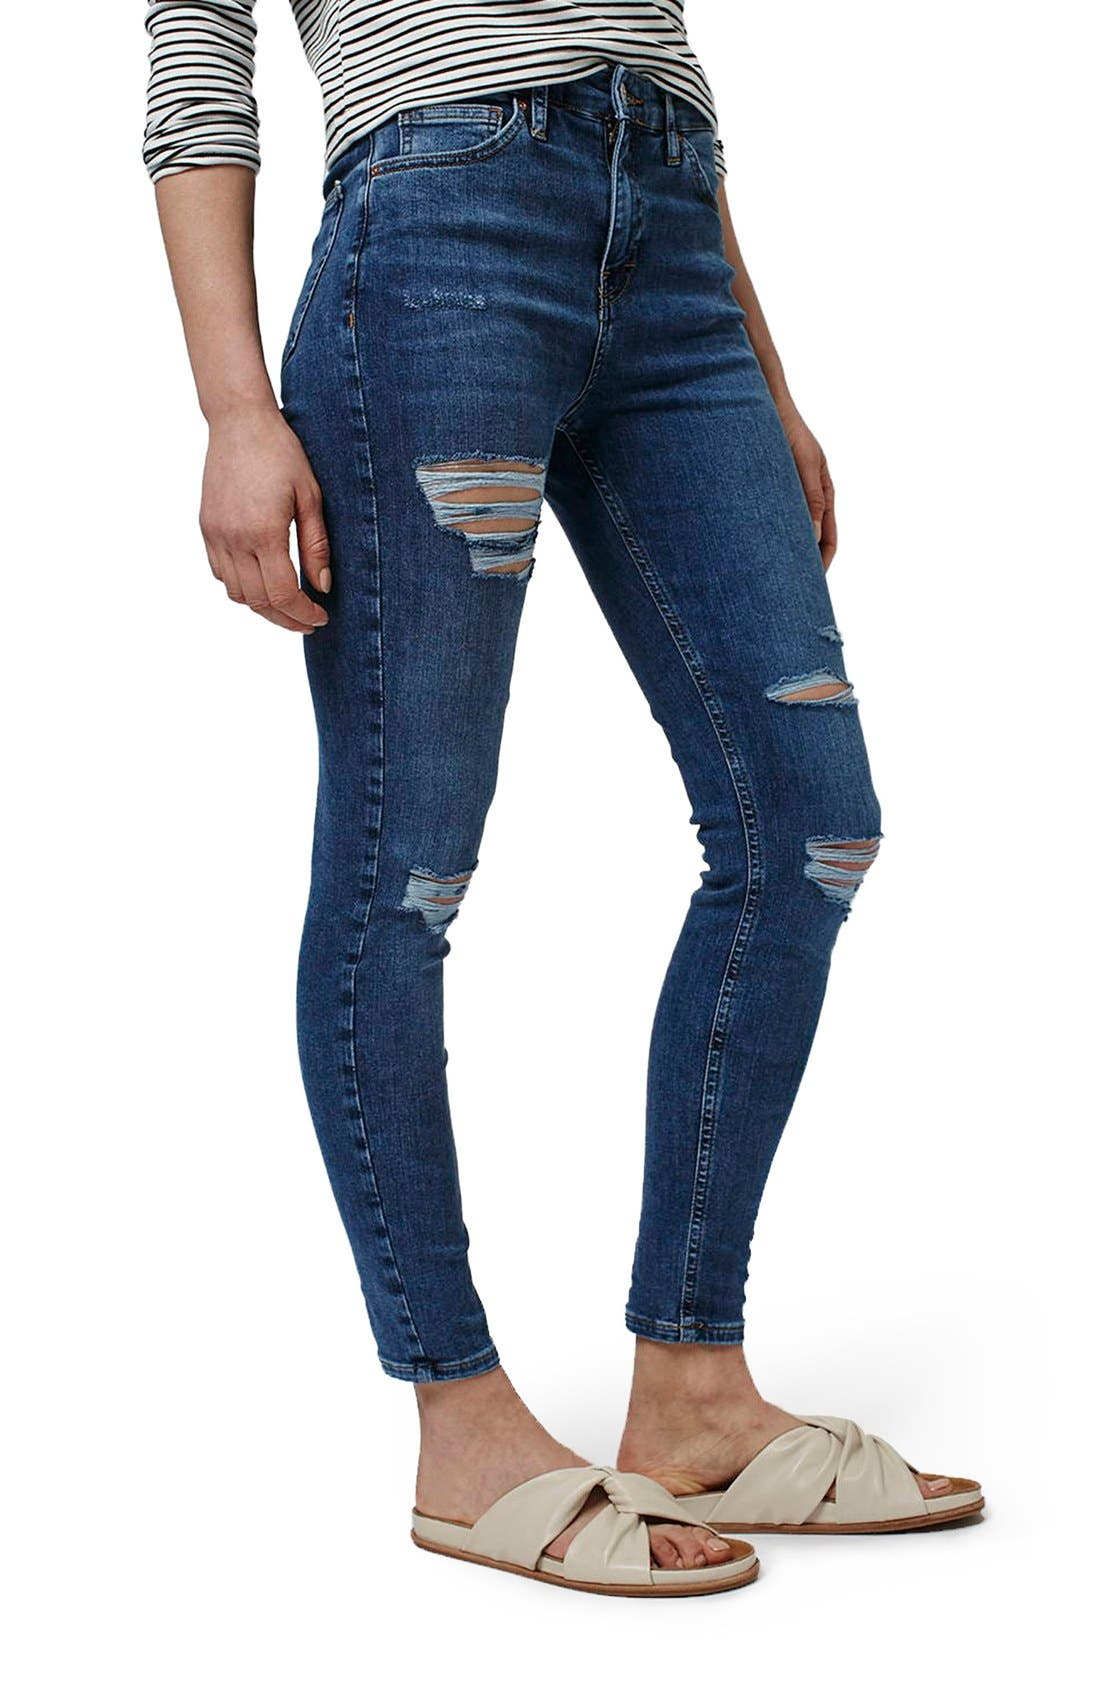 Main Image - Topshop Moto 'Jamie' Super Ripped Skinny Jeans